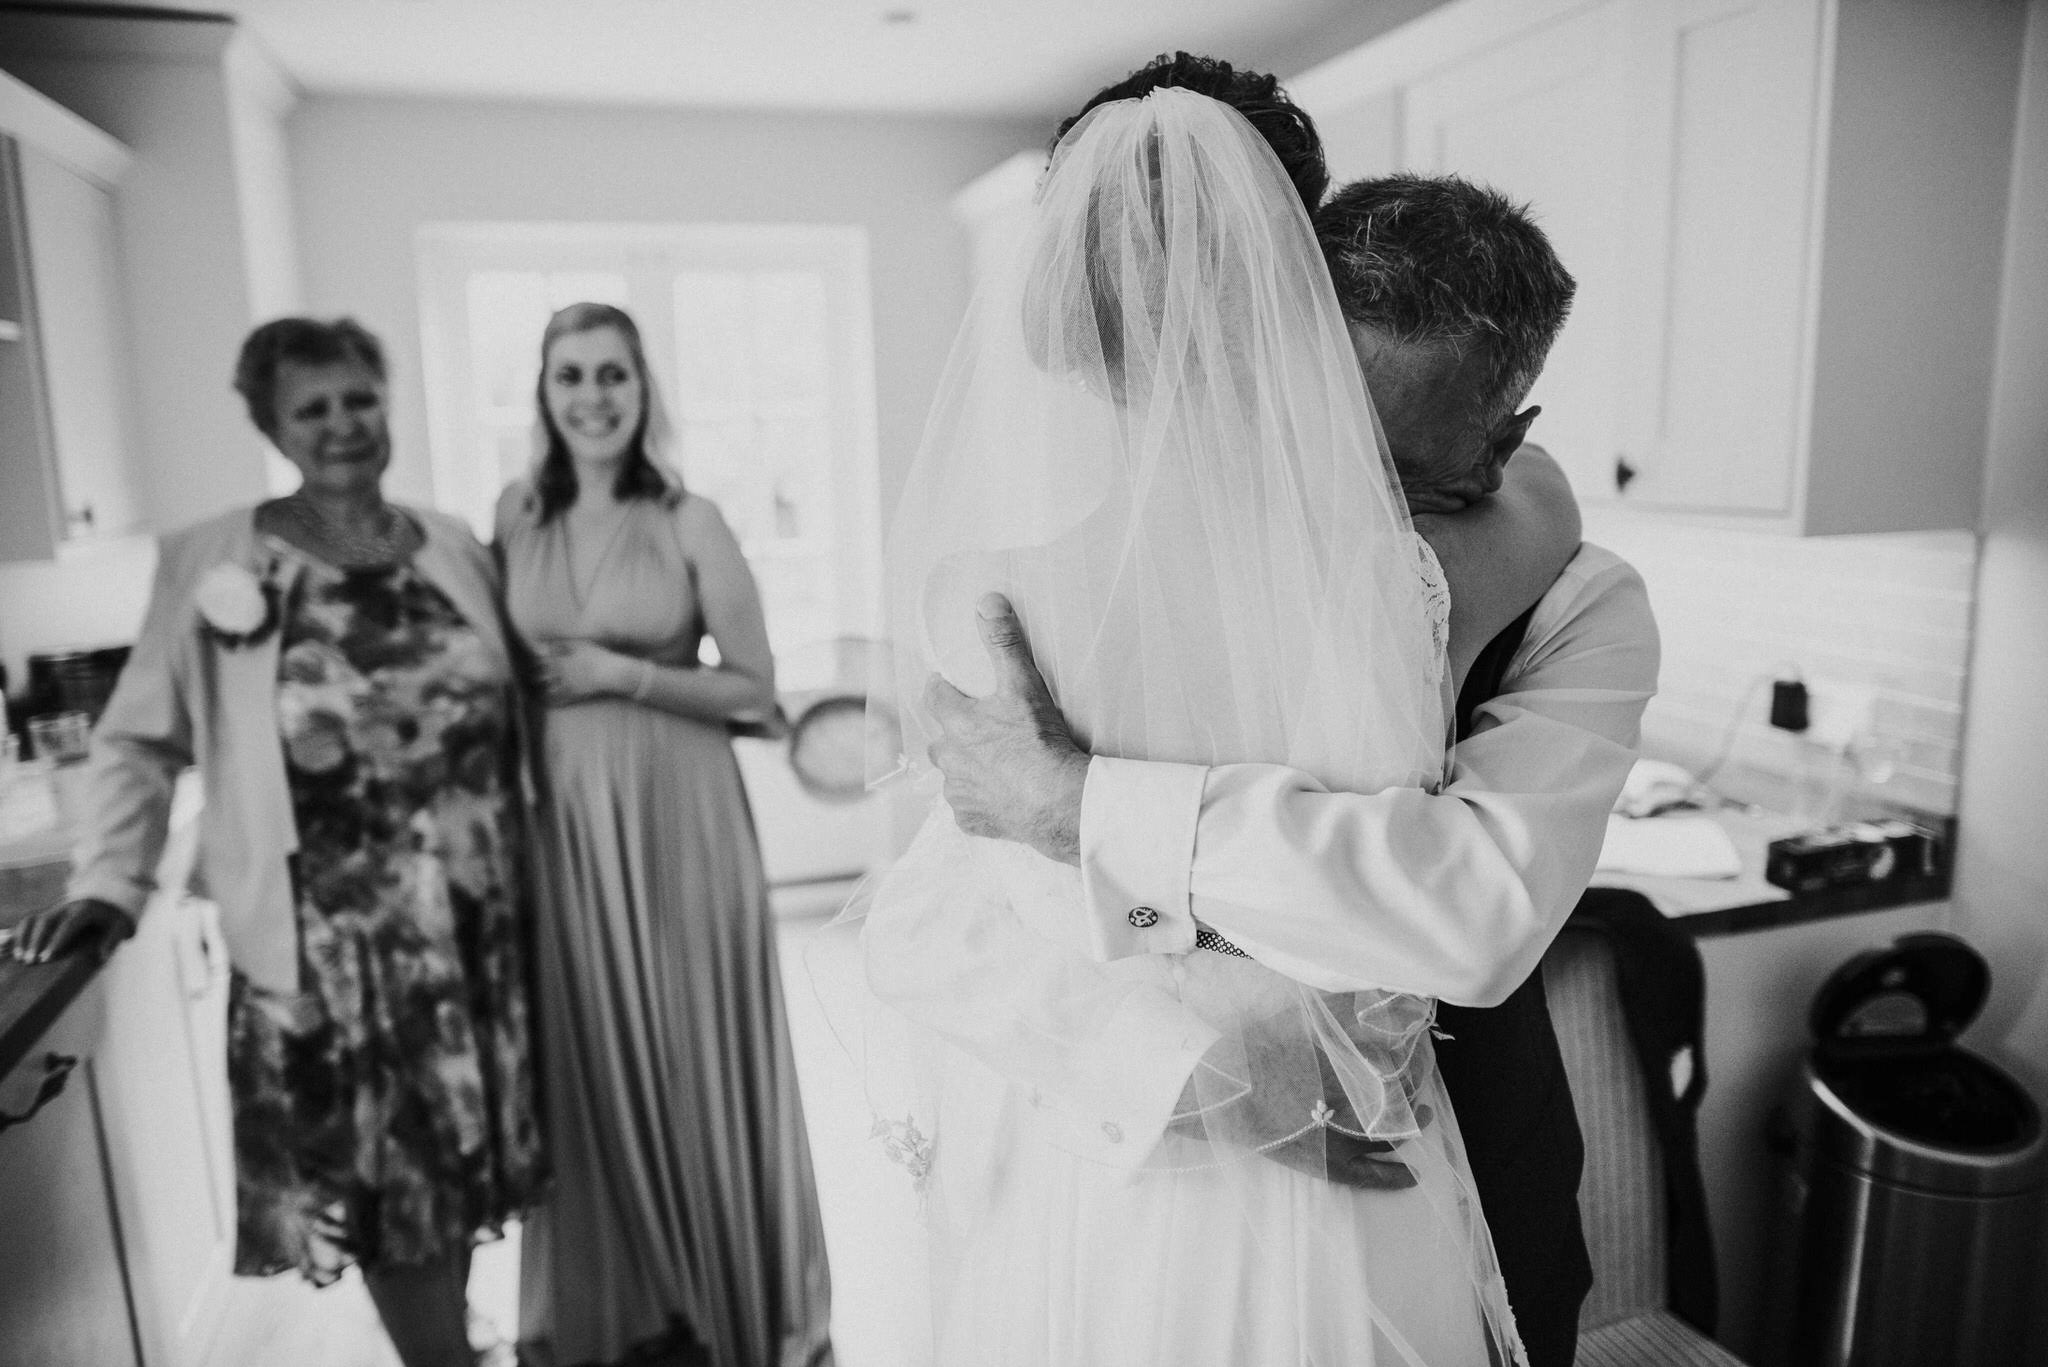 Dad hugs daughter on wedding day